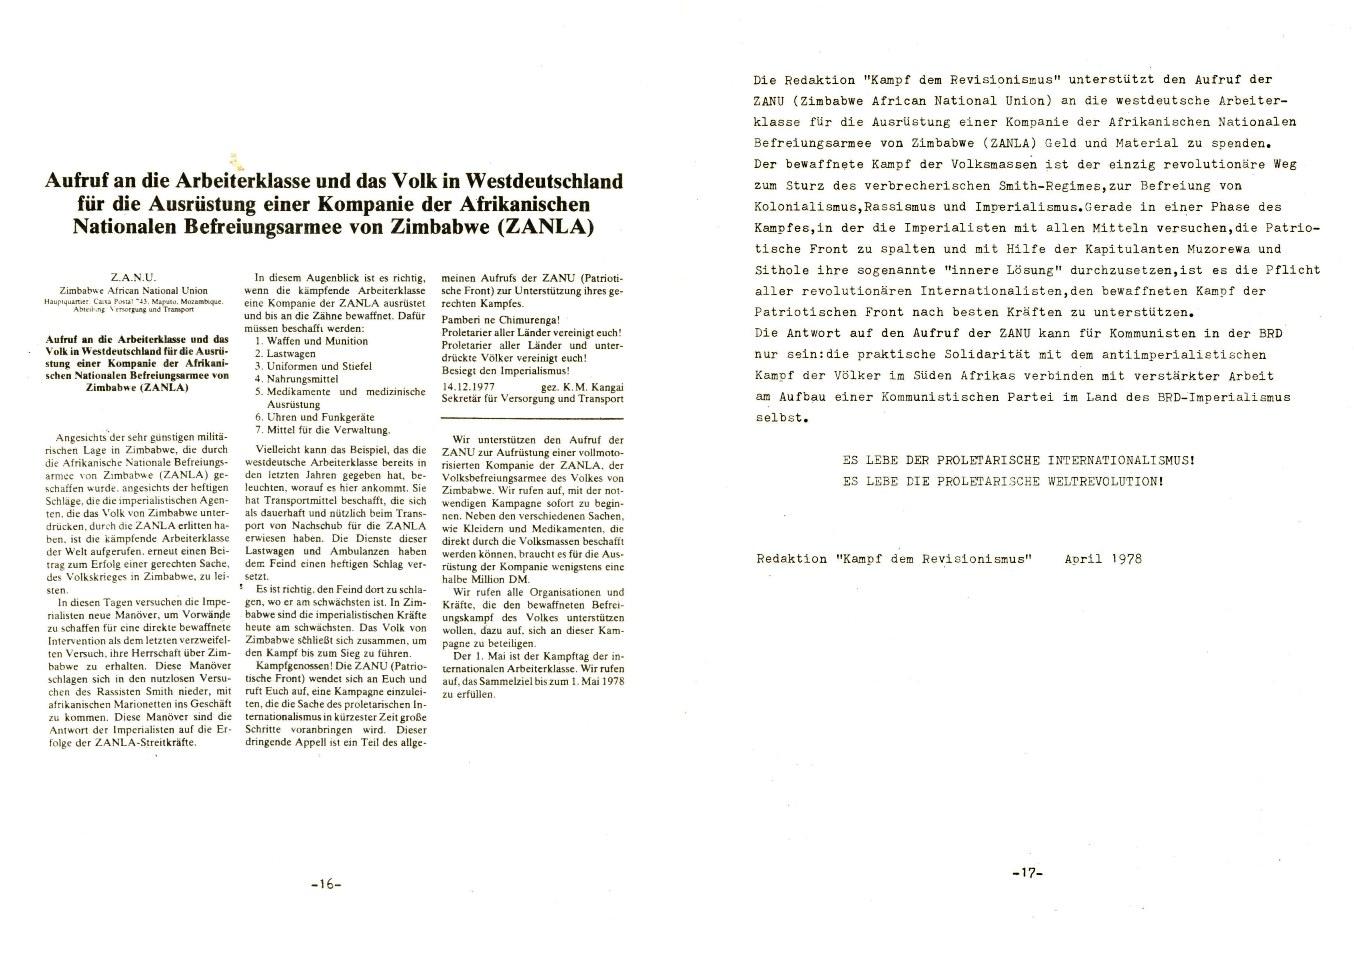 Muenchen_Kampf_dem_Revisionismus_1978_06_09